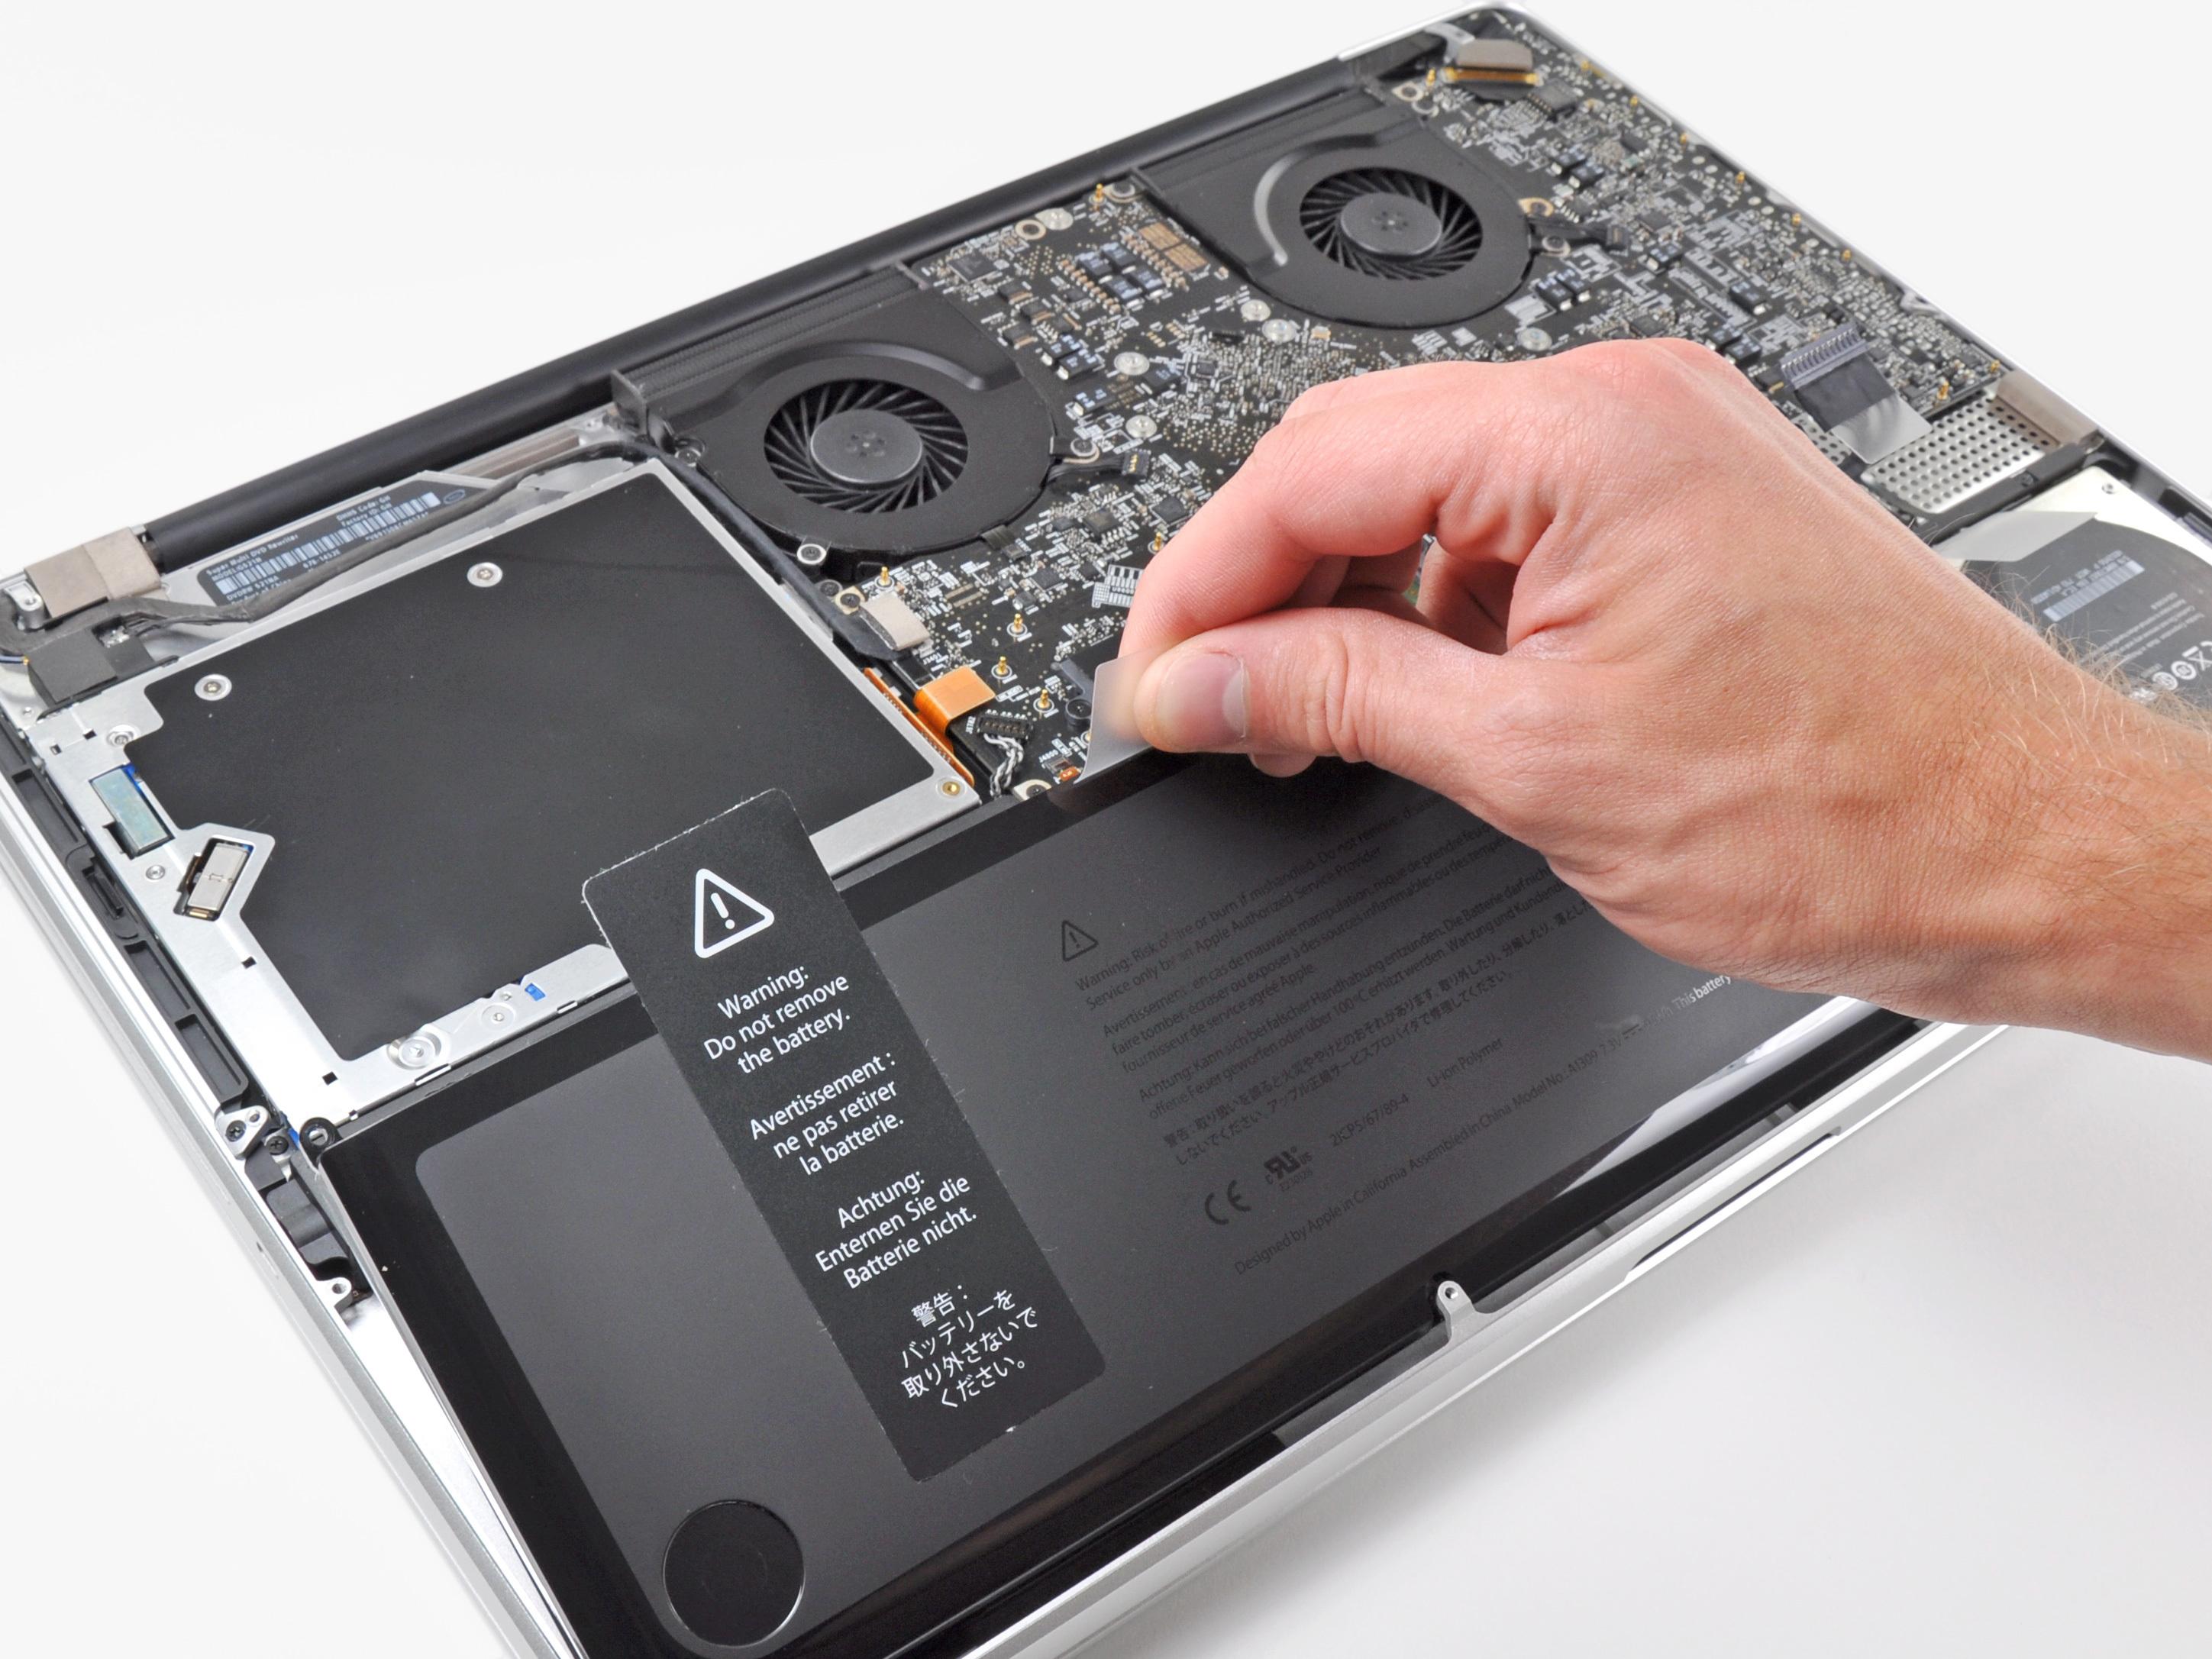 Извлечение аккумулятора из MacBook